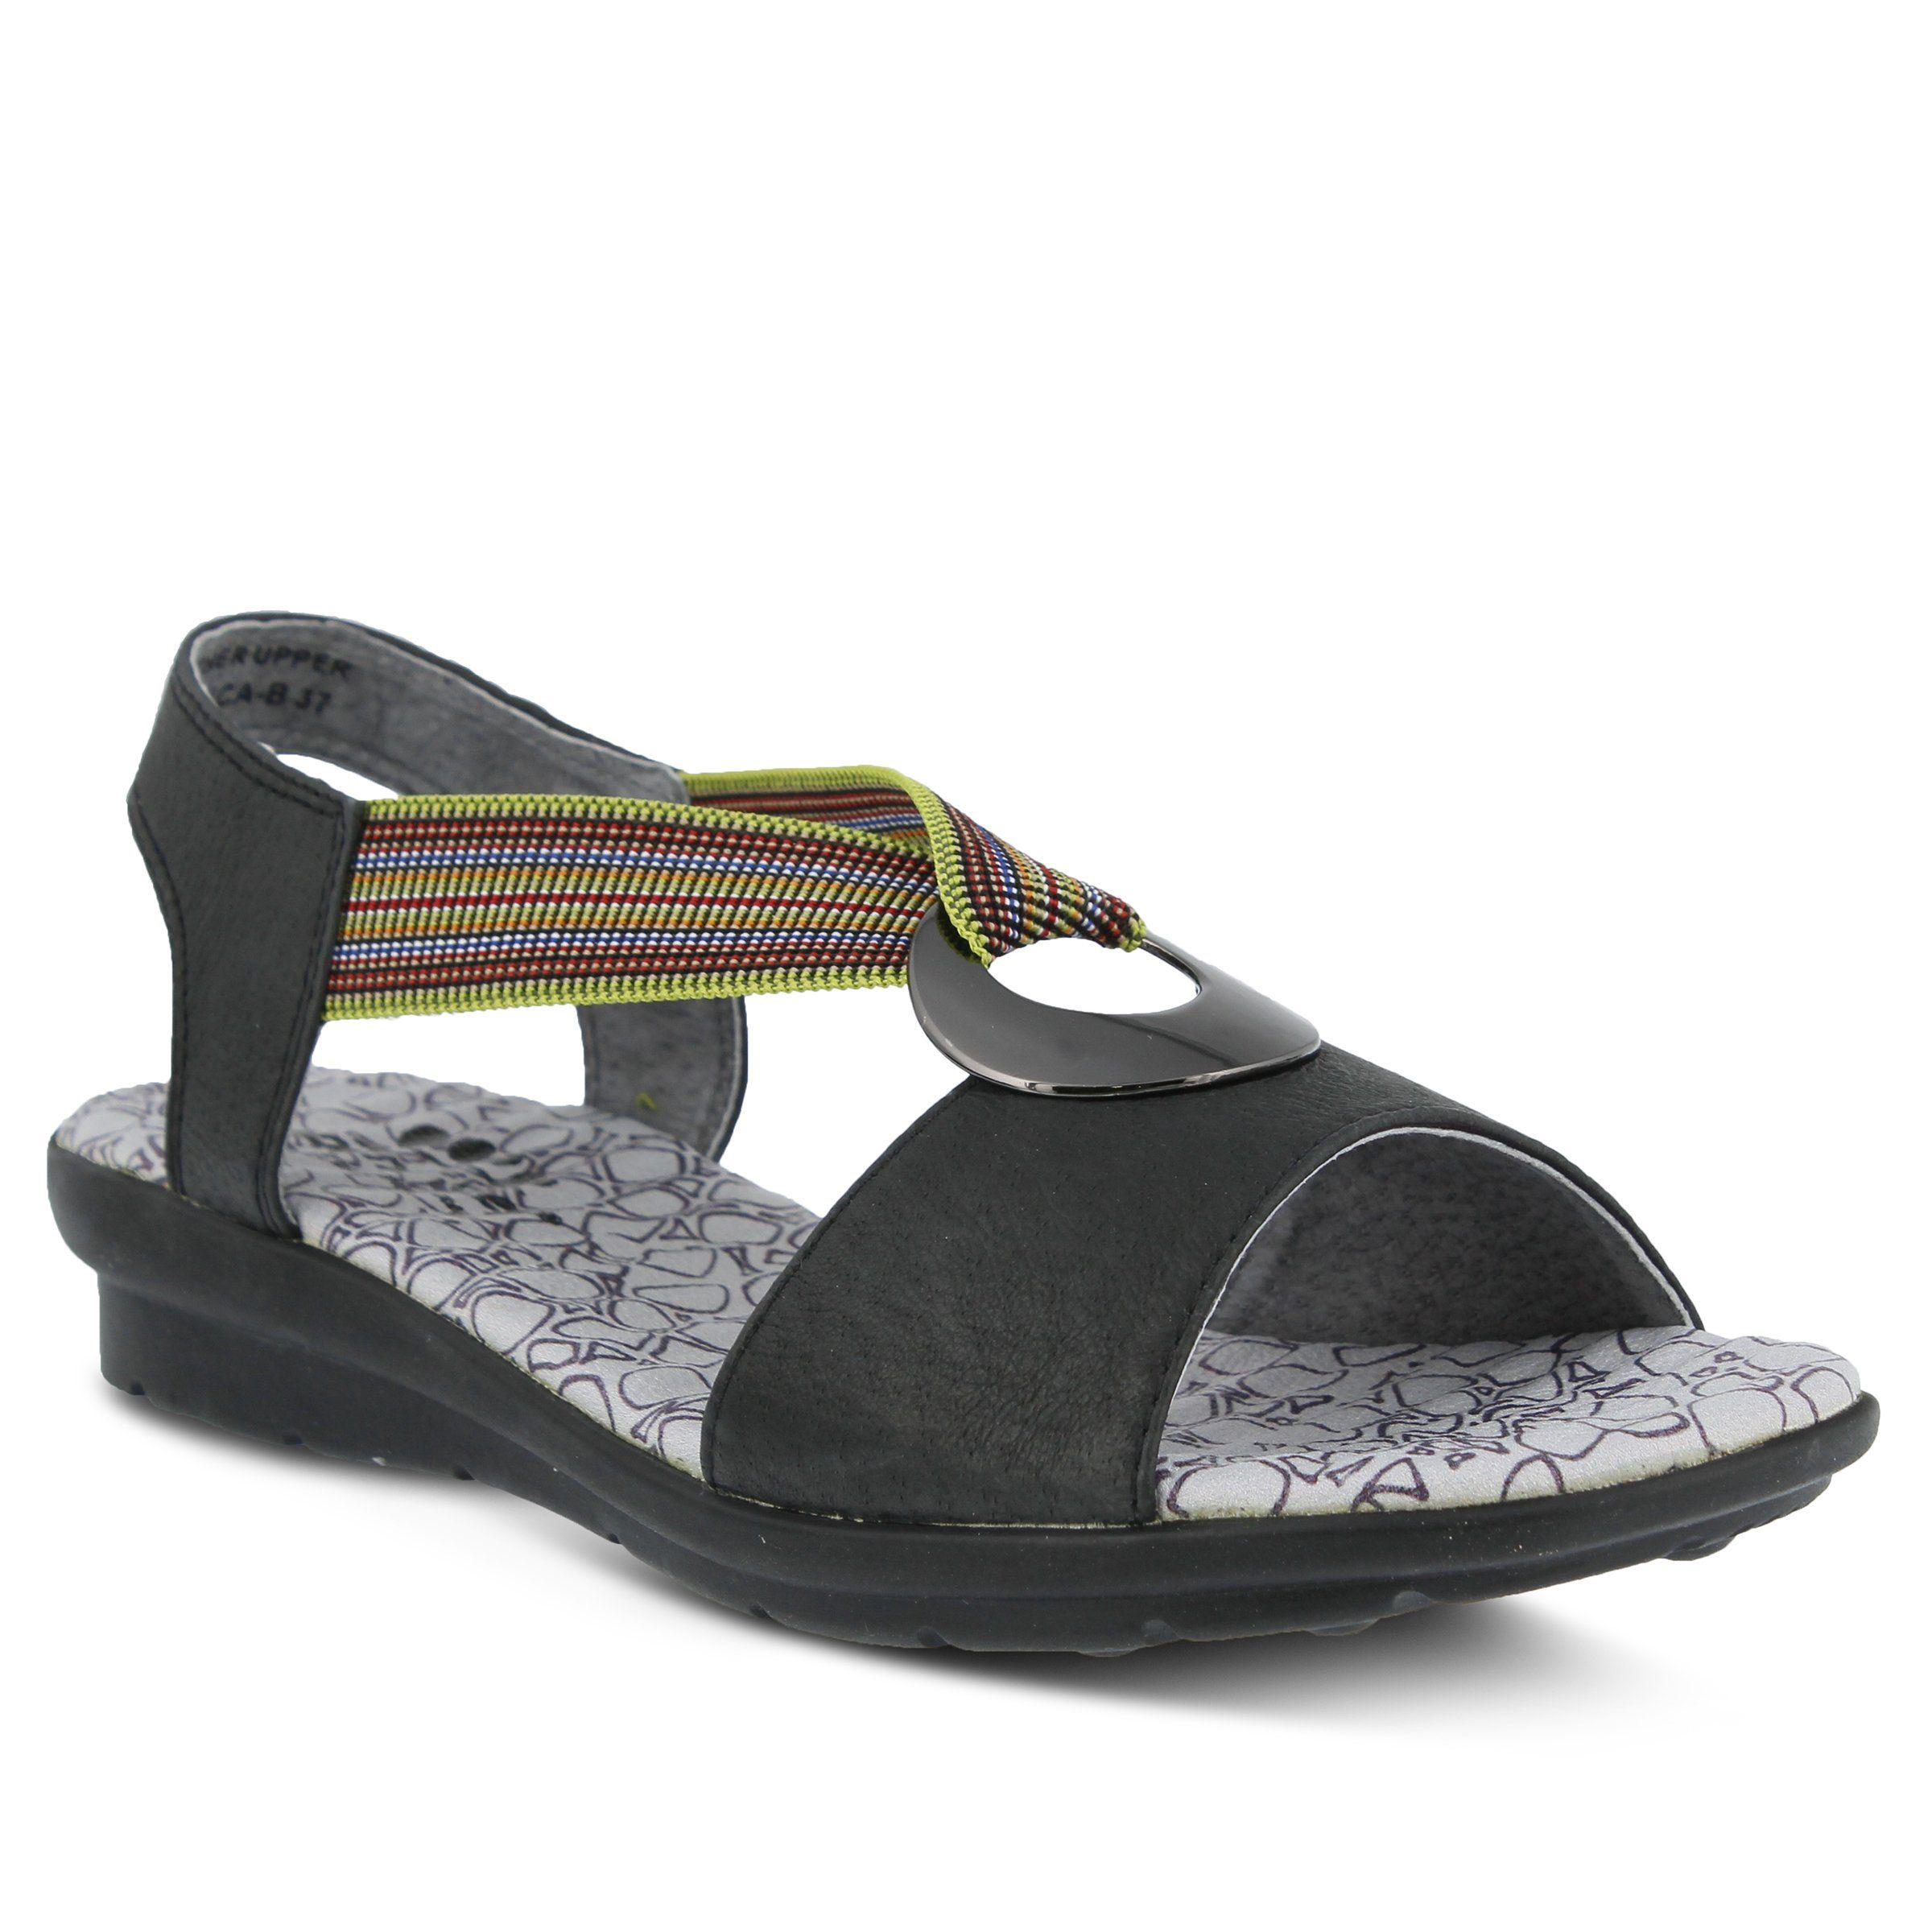 Rustica sandal